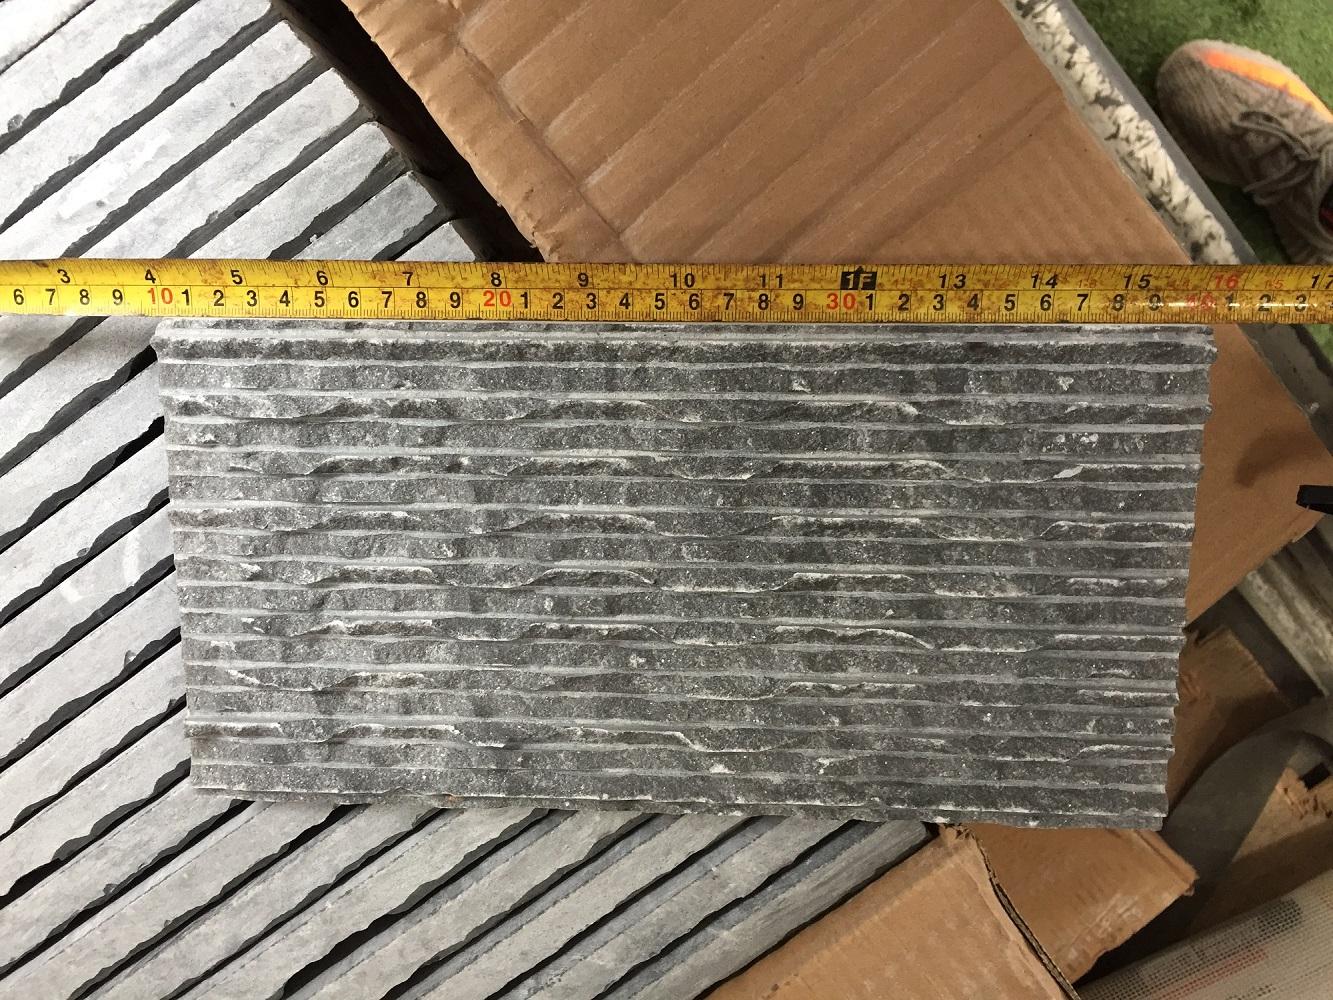 Tiles inspection